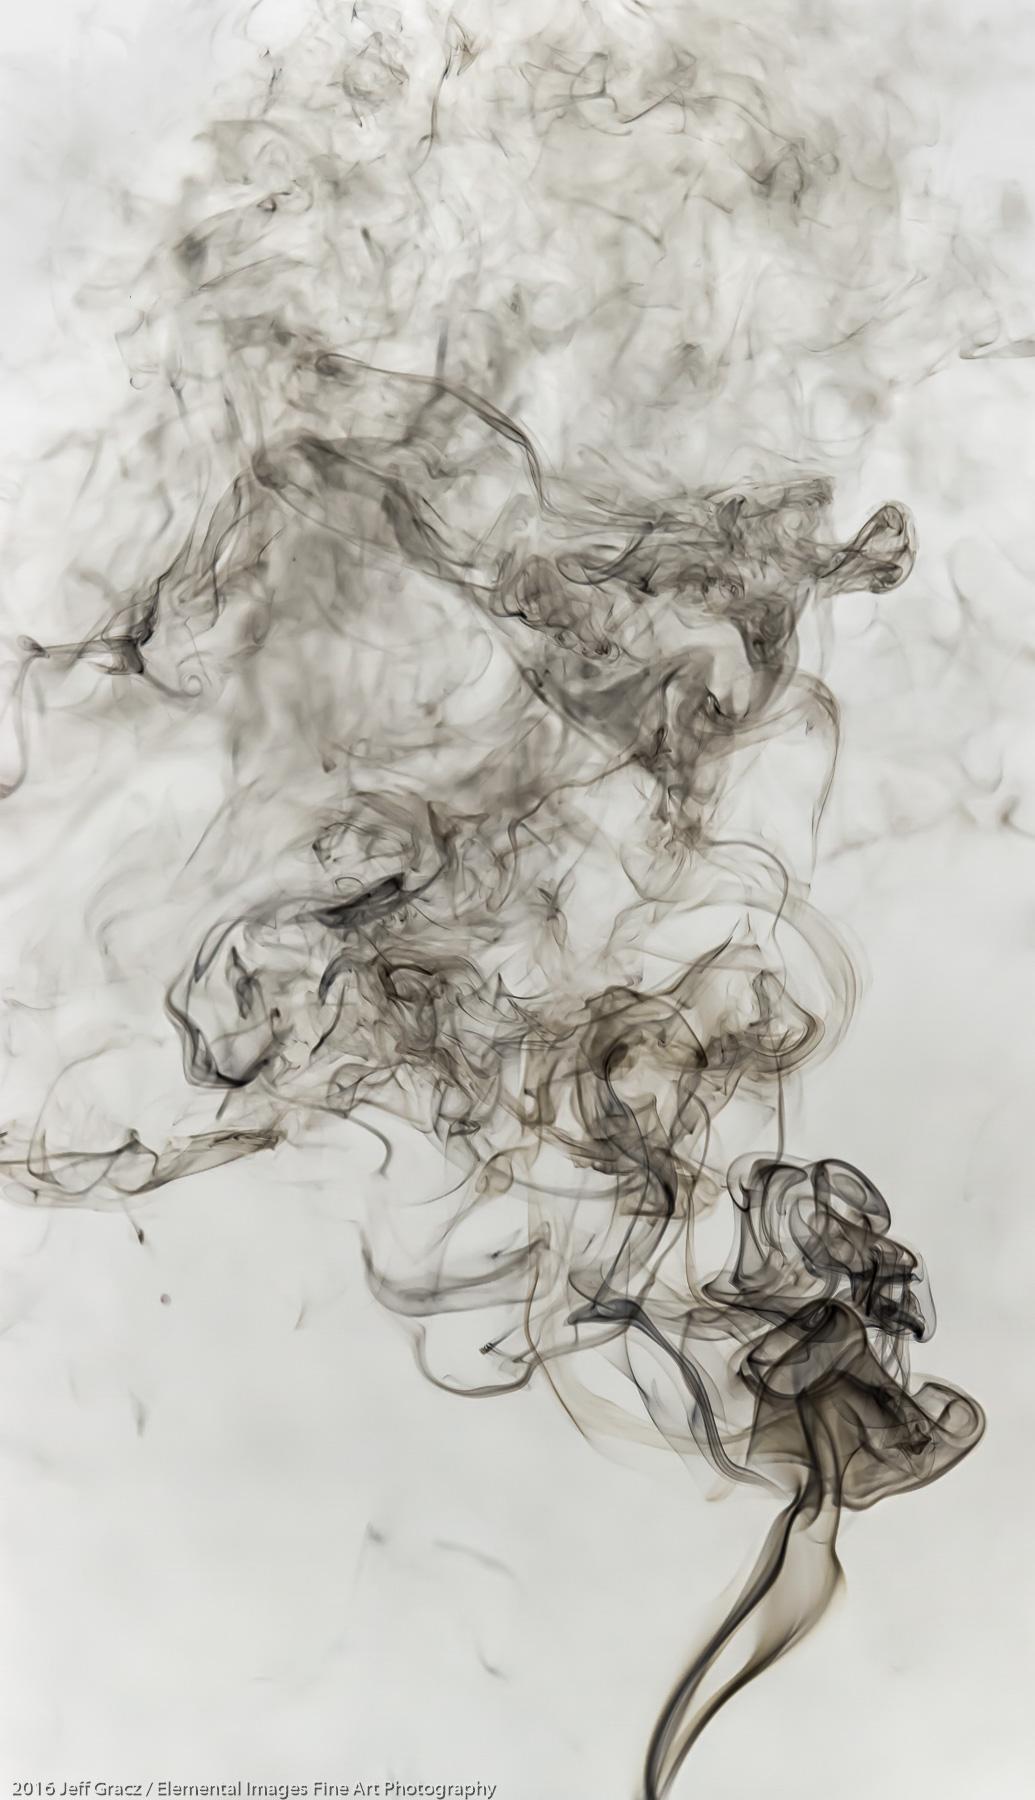 Smoke 34 | Vancouver | WA | USA - © 2016 Jeff Gracz / Elemental Images Fine Art Photography - All Rights Reserved Worldwide